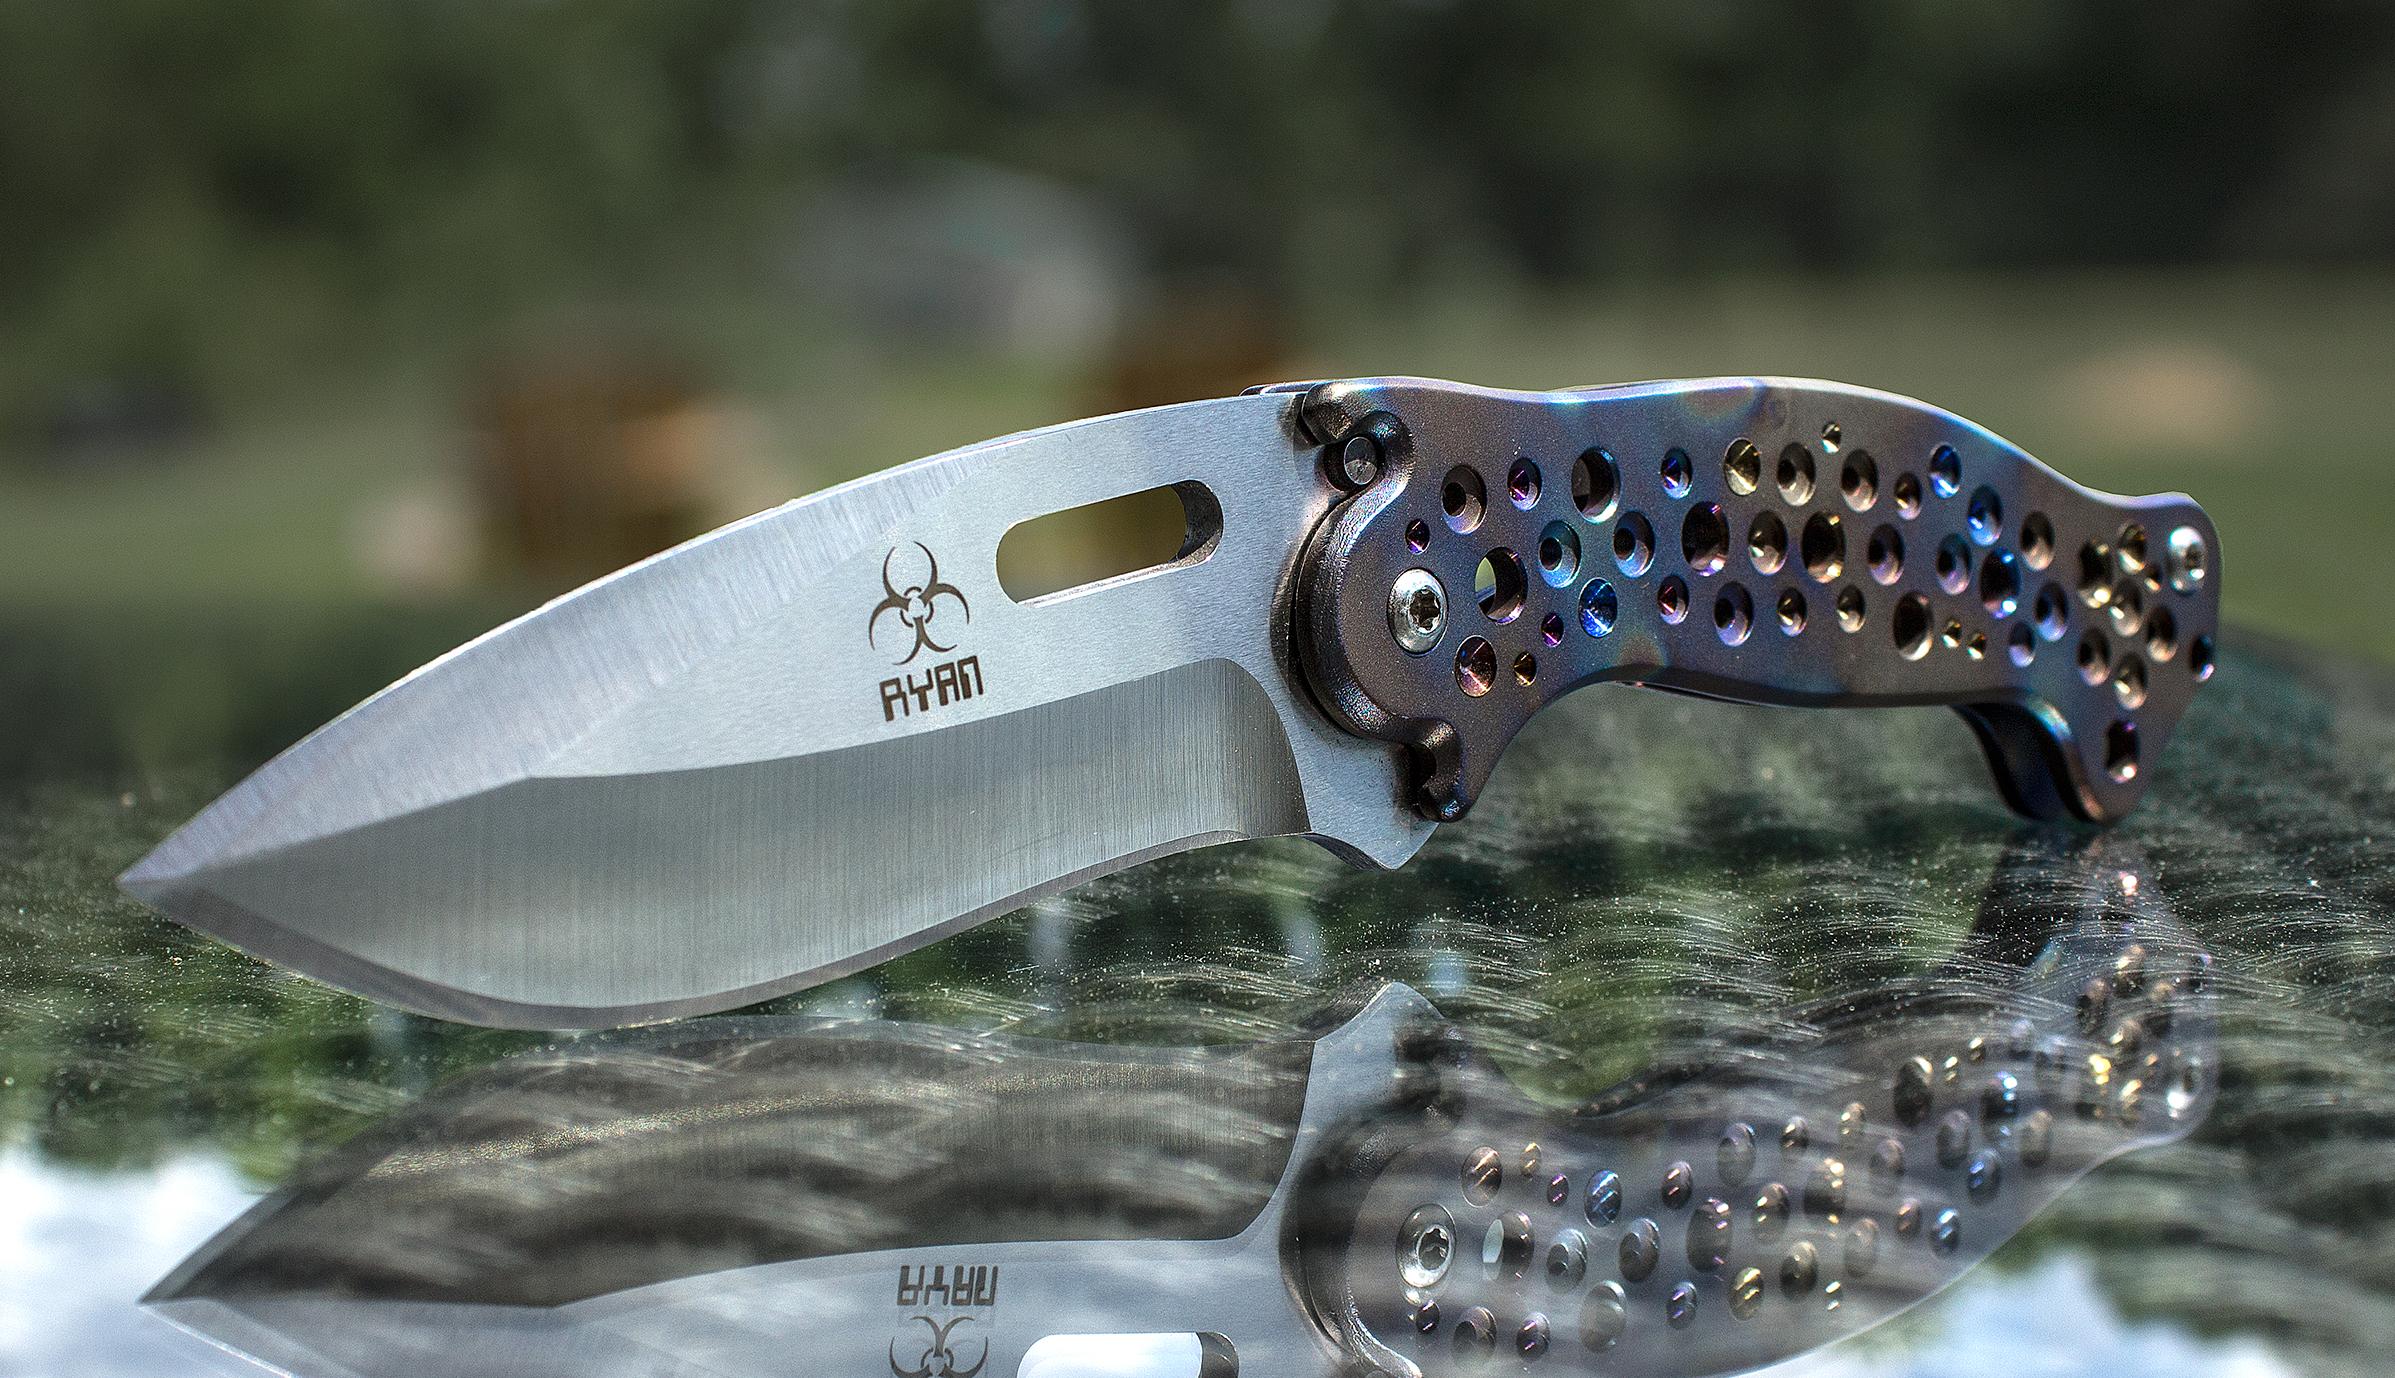 Steve Ryan Custom Knives